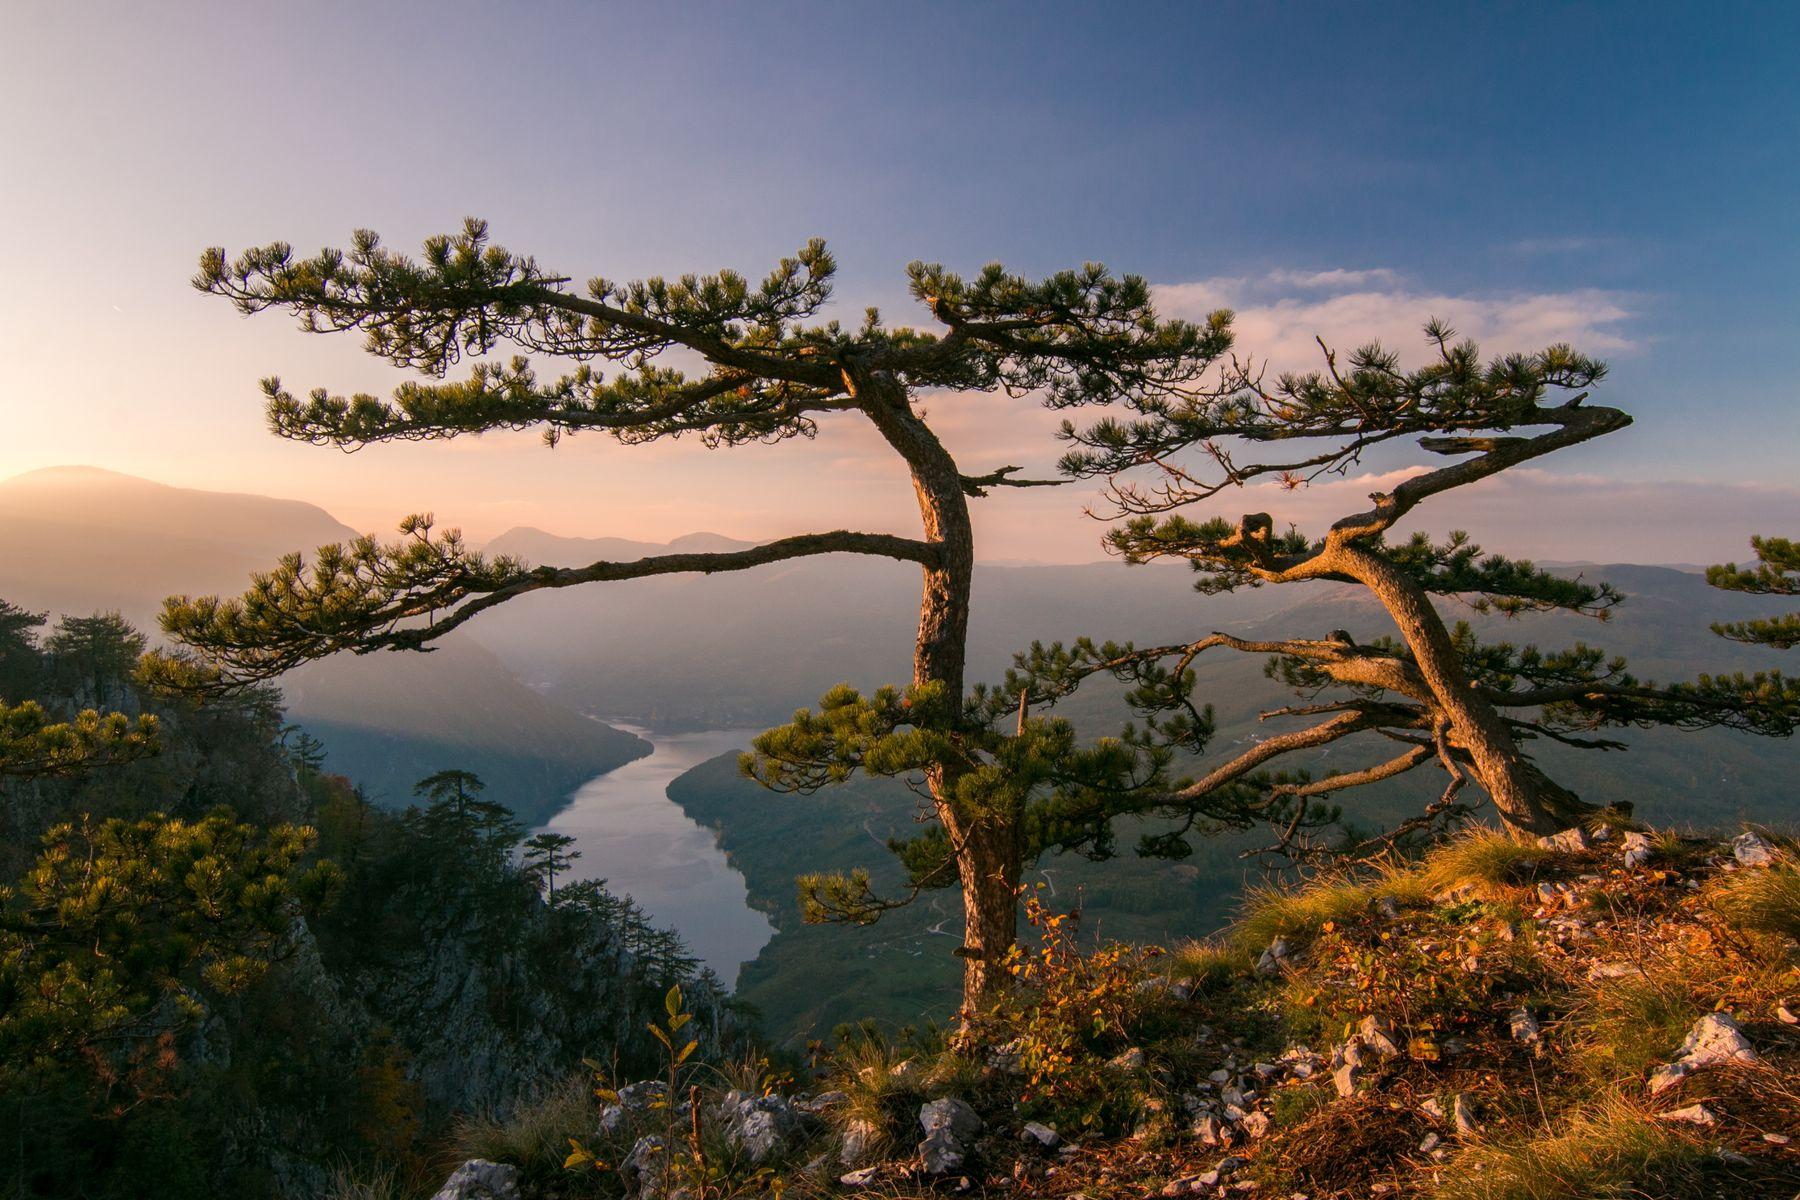 Zalazak sa najlepšim pogledom (Sunset with the most beautiful view), Nenad Marić